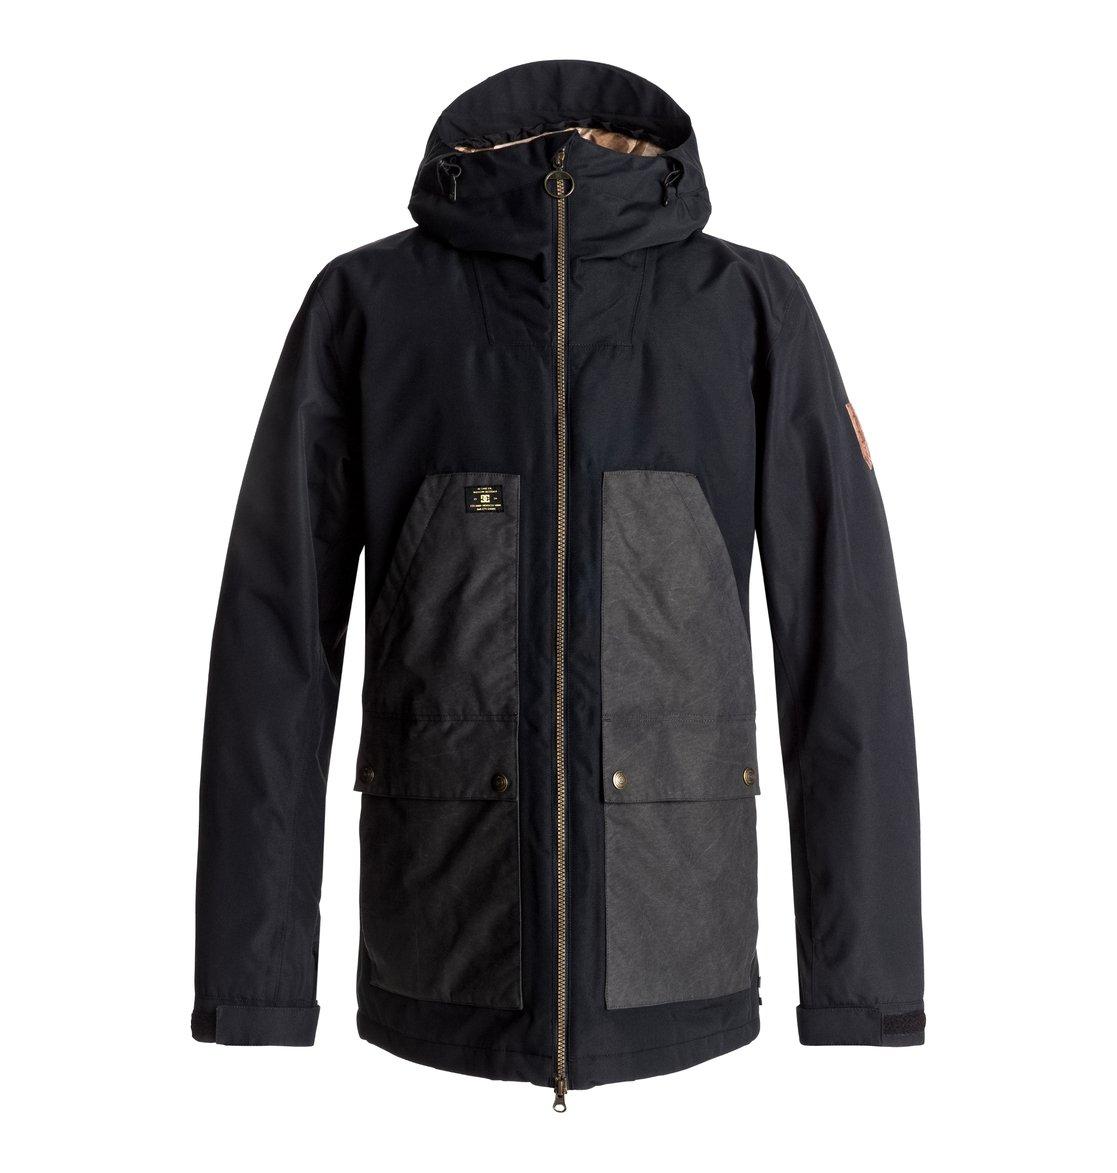 Сноубордическая куртка Summit от DC Shoes